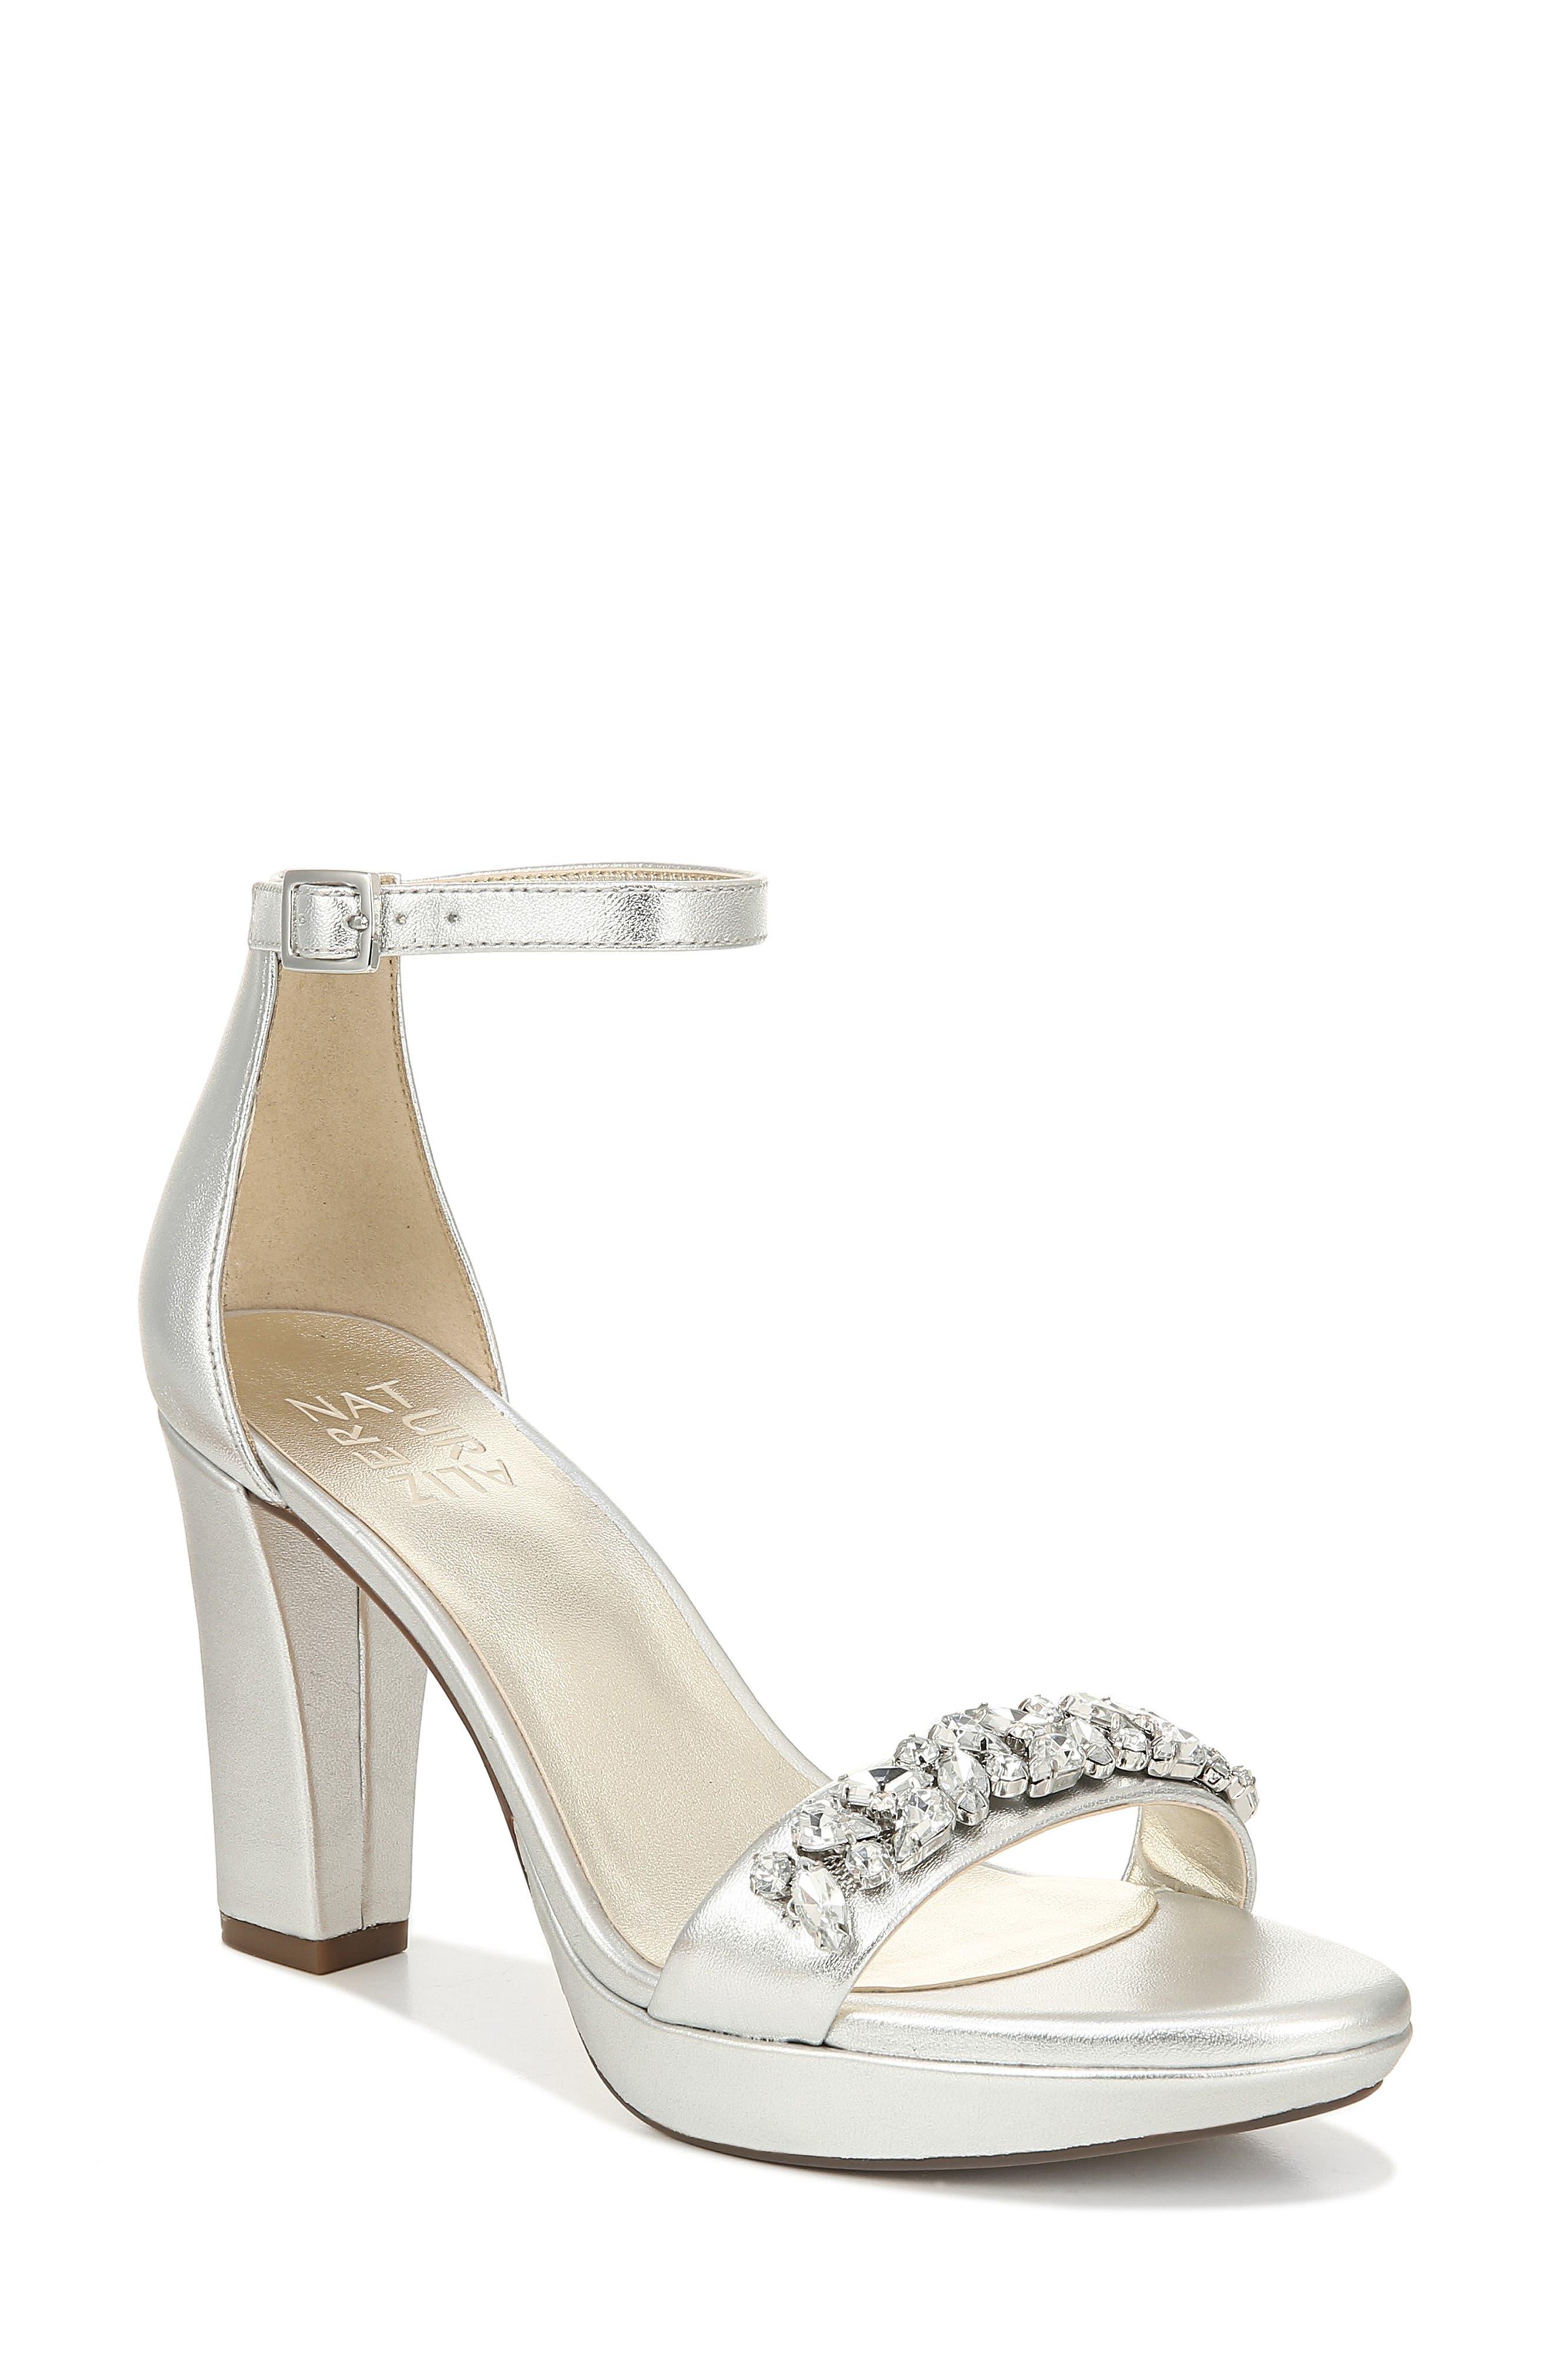 Naturalizer Cassano Crystal Embellished Sandal, Metallic